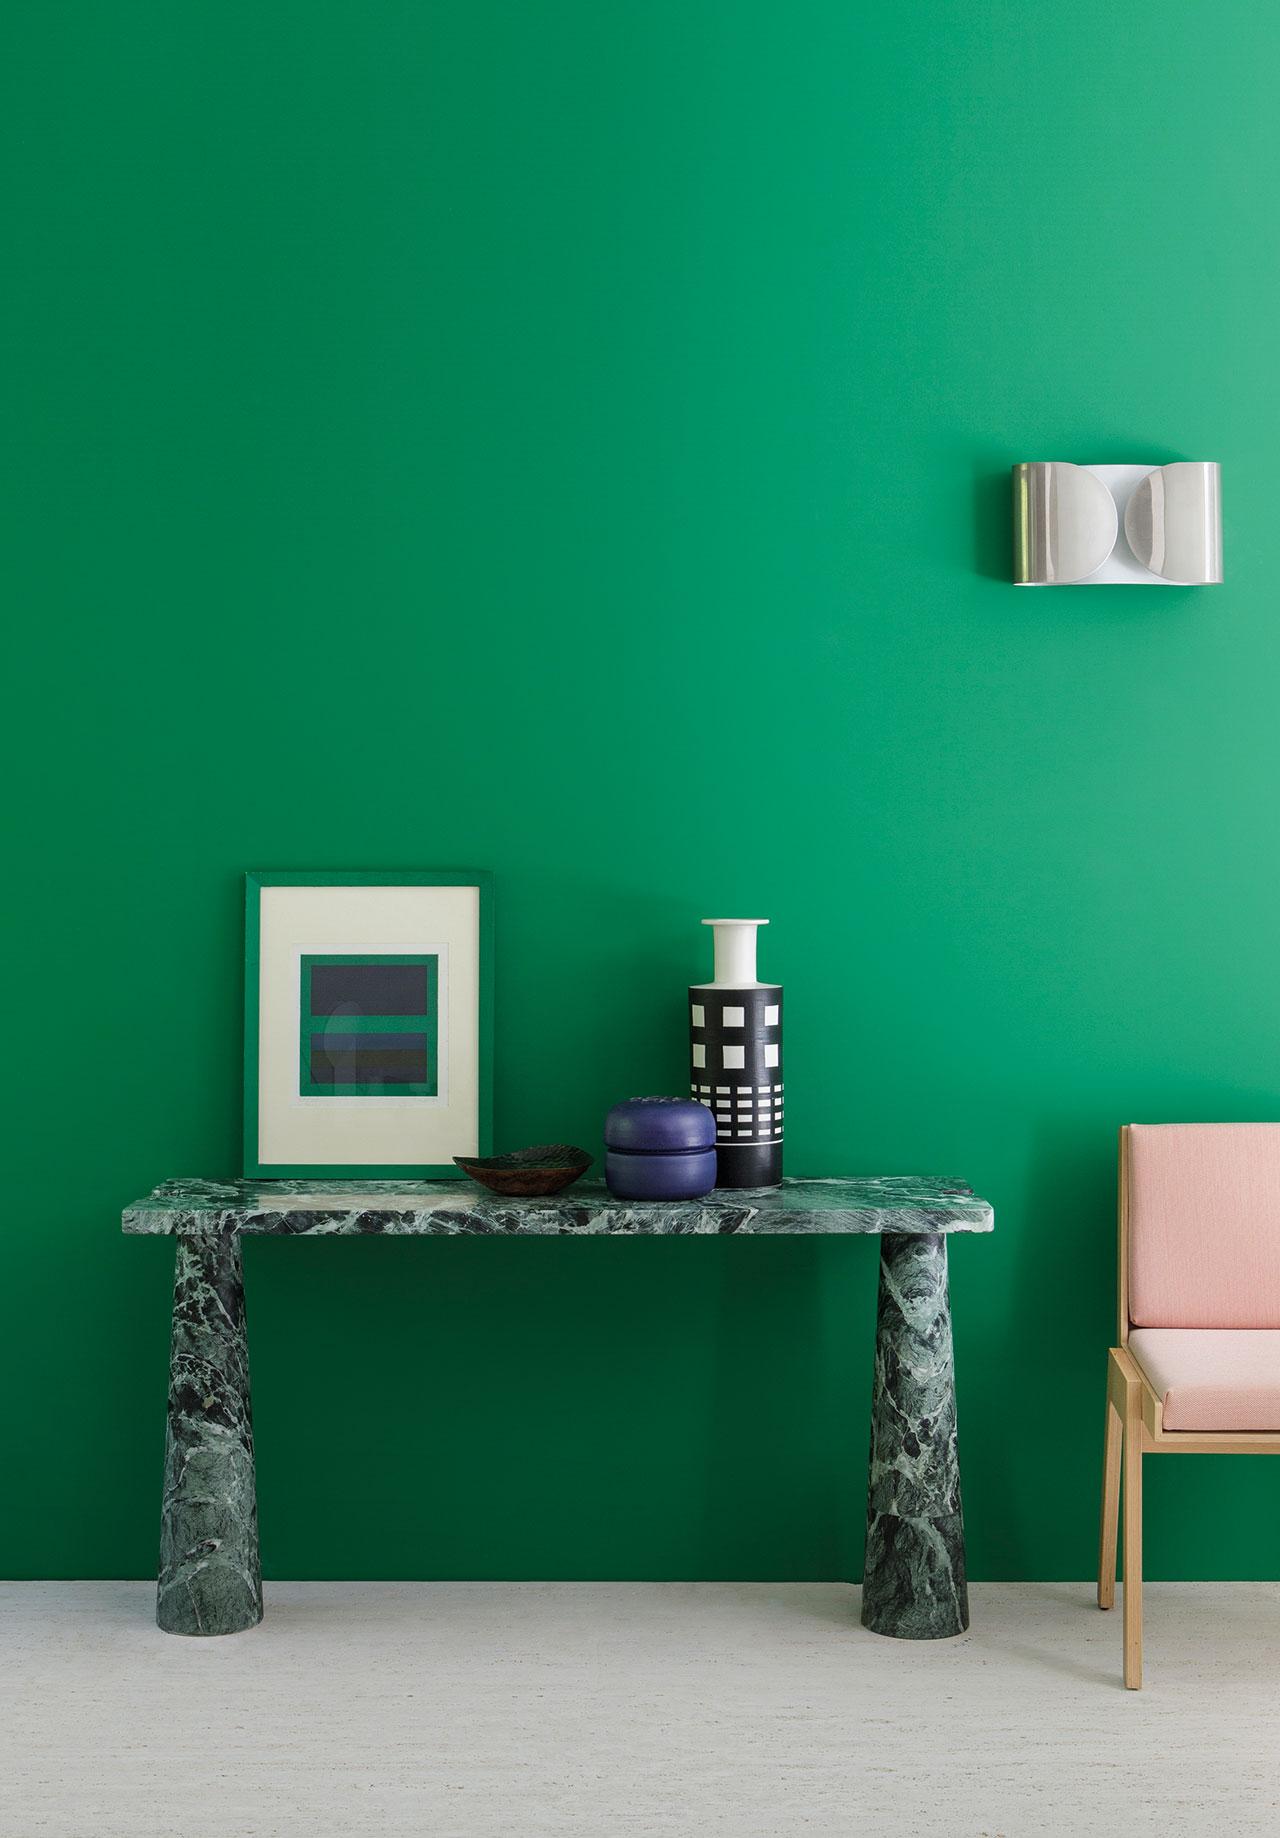 Eros table, The Mangiarotti Collection, Agapecasa© Agape